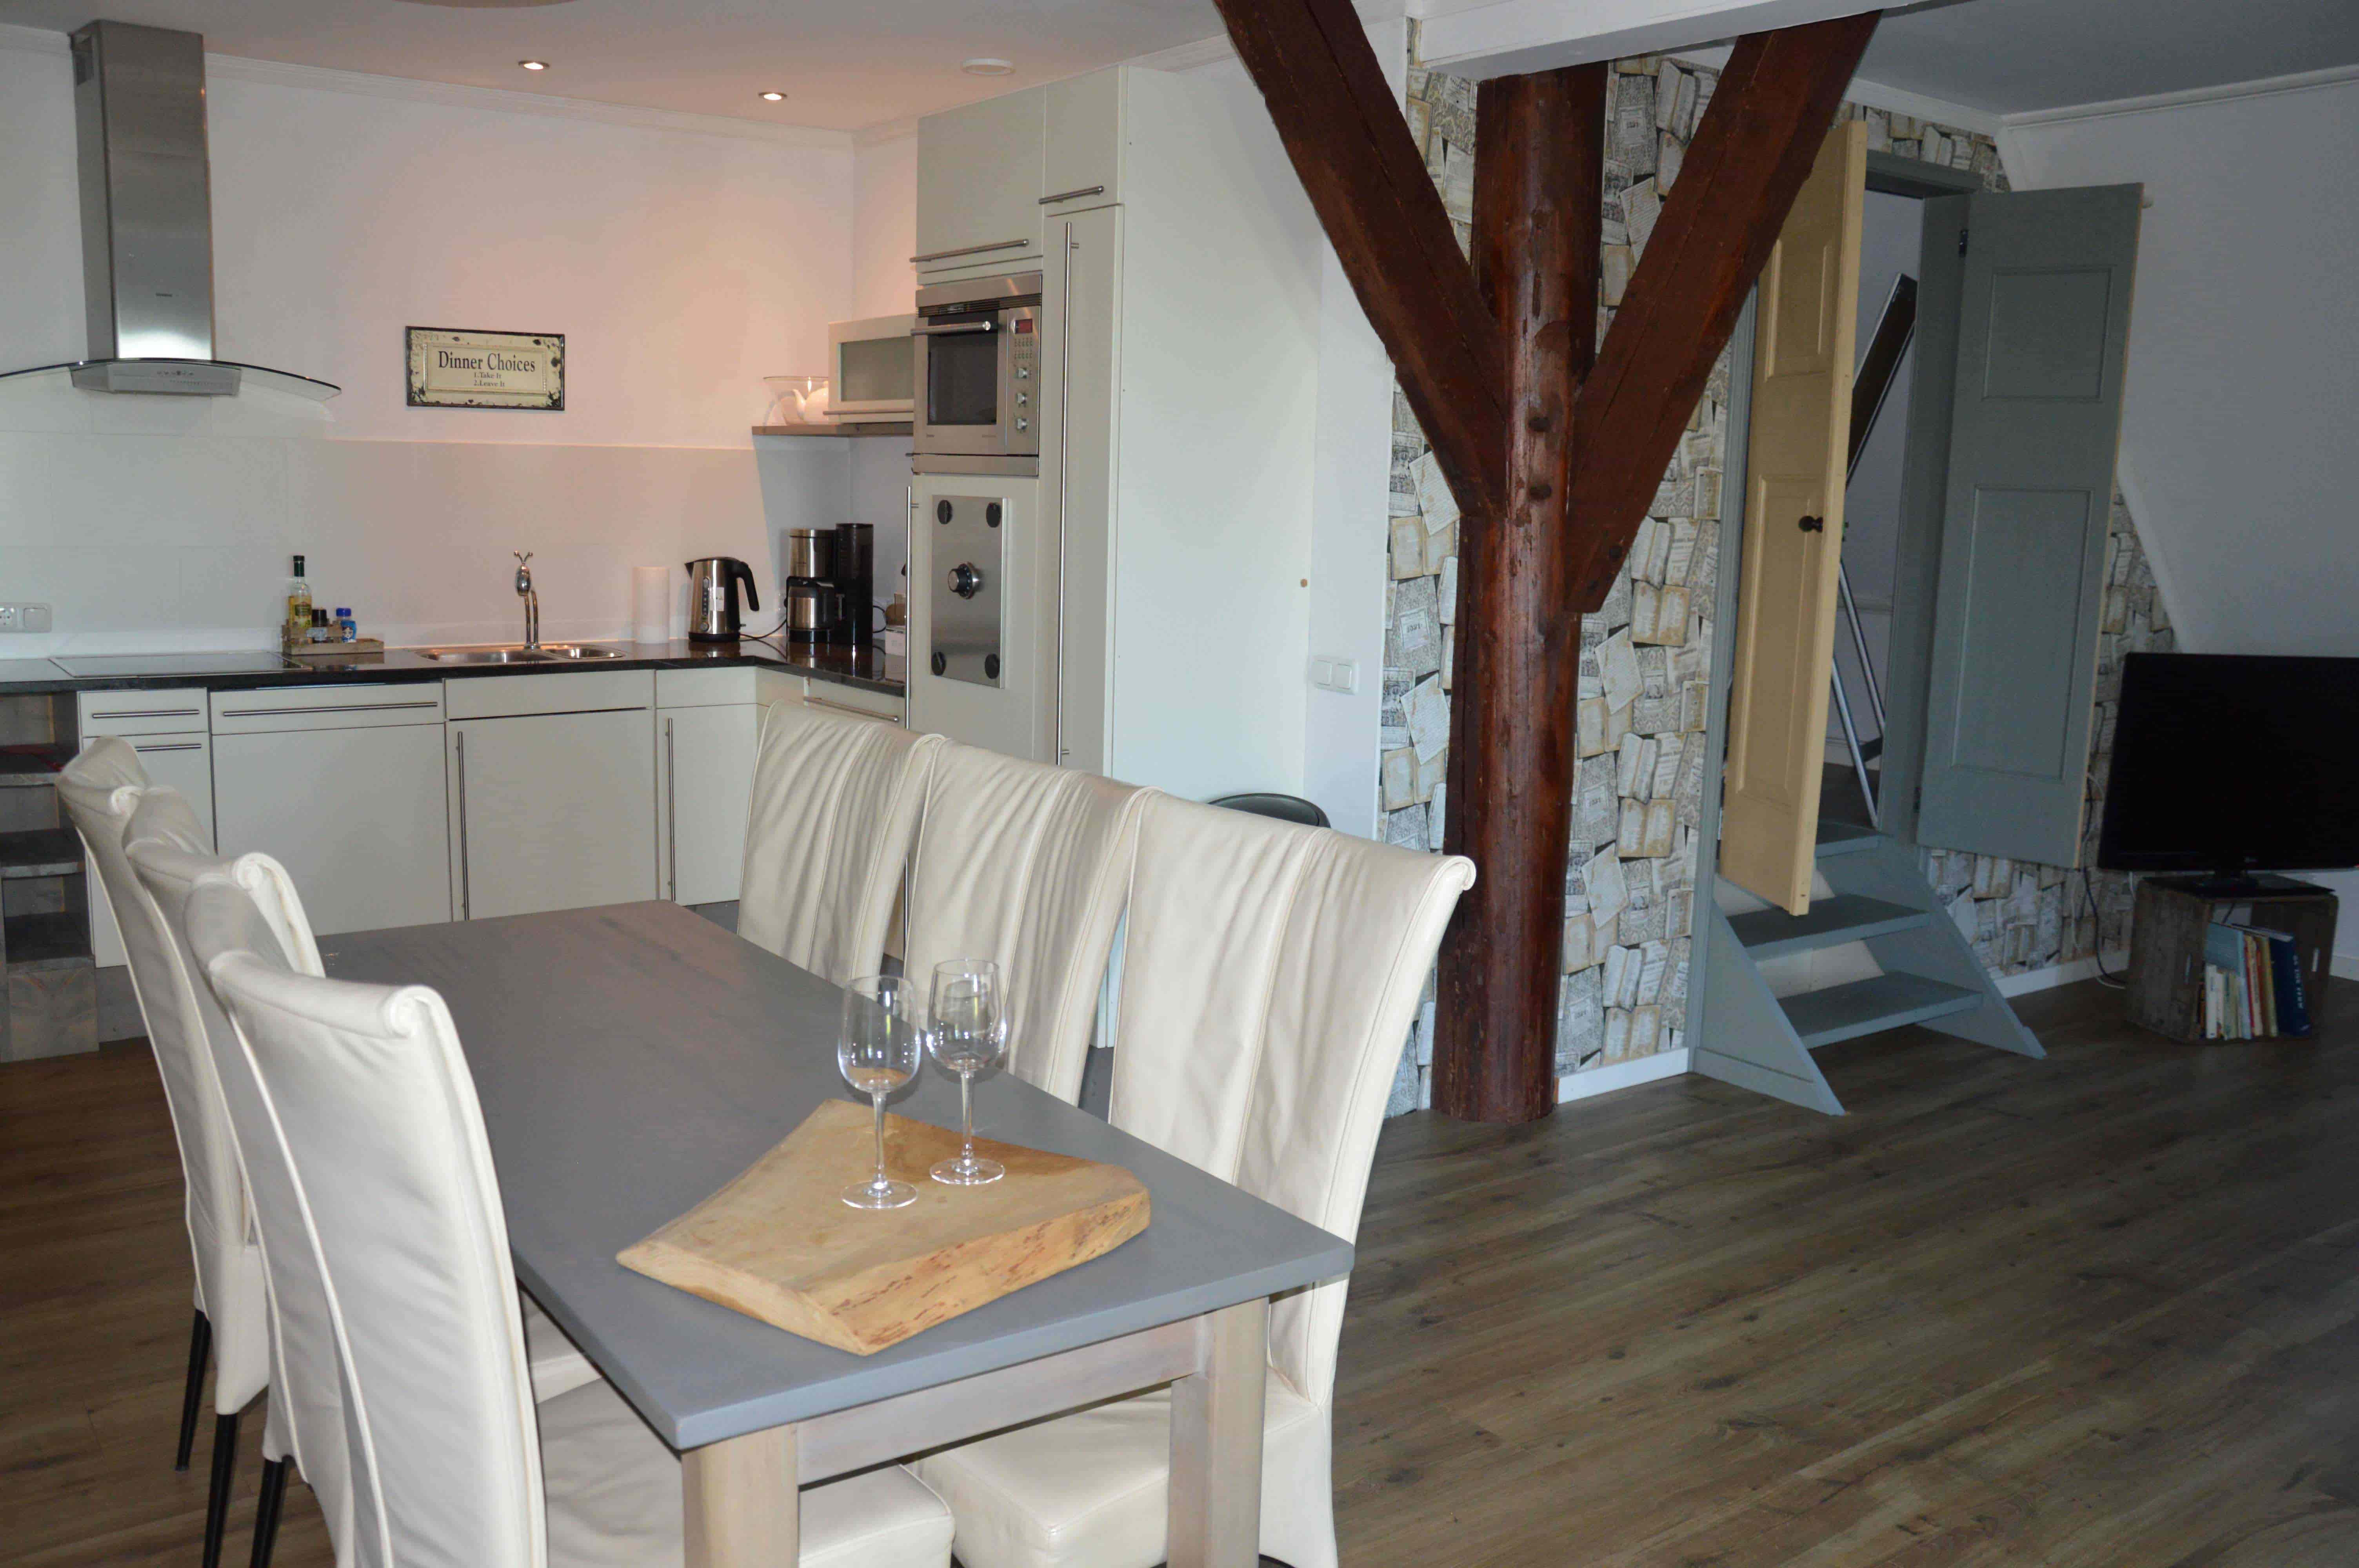 Wellness_appartement_sauna_Bed_&_Breakfast_Friesland_Noord_Nederland_Natuur_Rust_Vrijheid_woonkamer